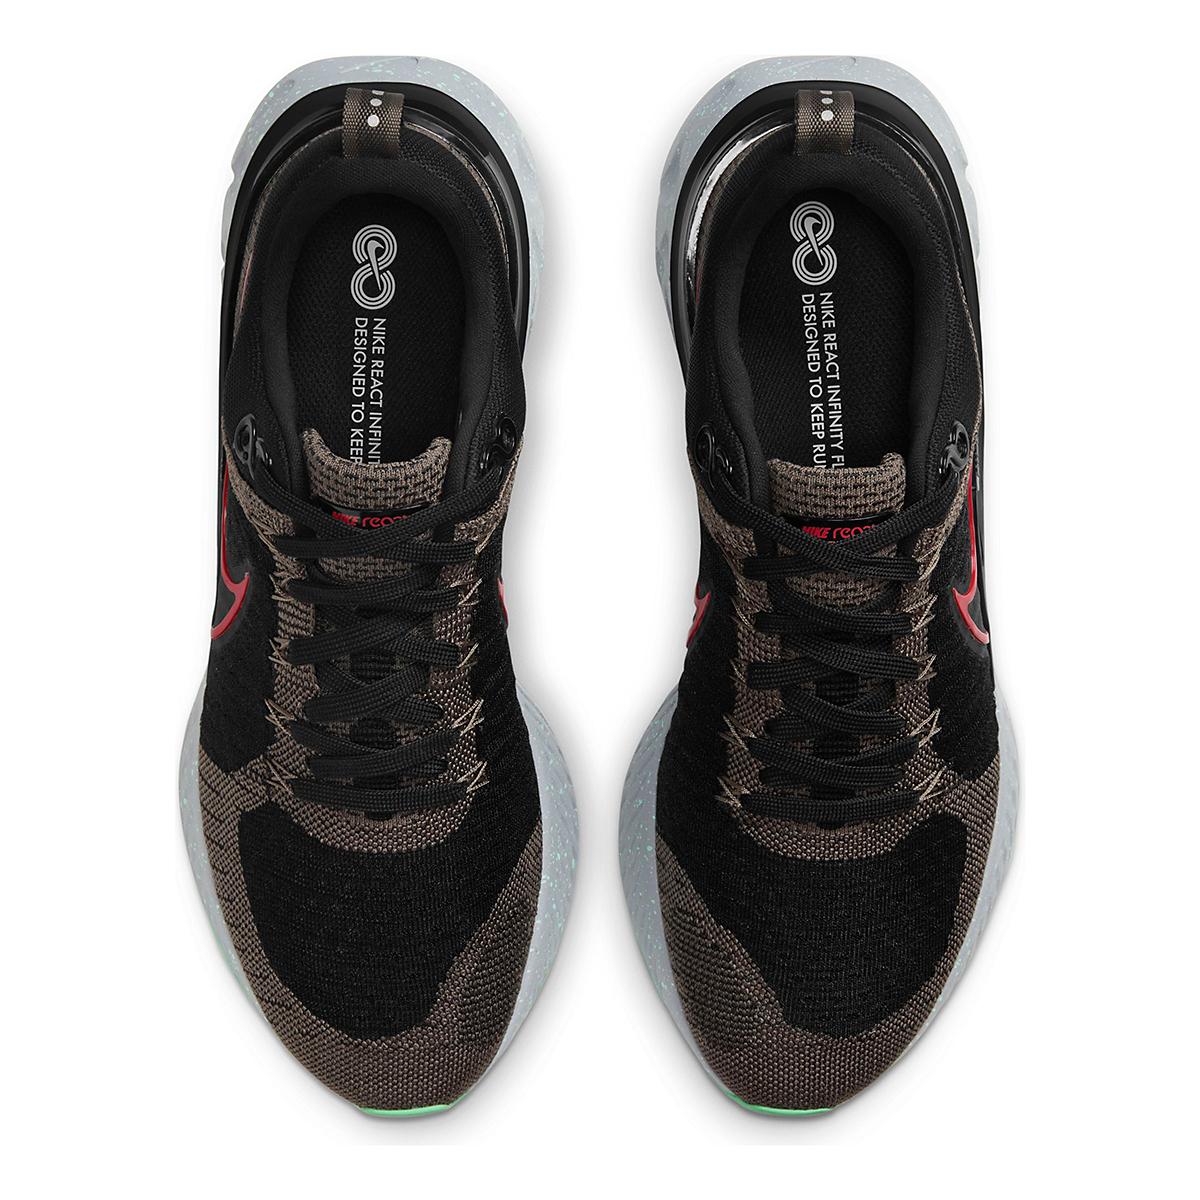 Men's Nike React Infinity Run Flyknit 2 Running Shoe - Color: Ridgerock/Chile Red/Black/Green Glow - Size: 6 - Width: Regular, Ridgerock/Chile Red/Black/Green Glow, large, image 6